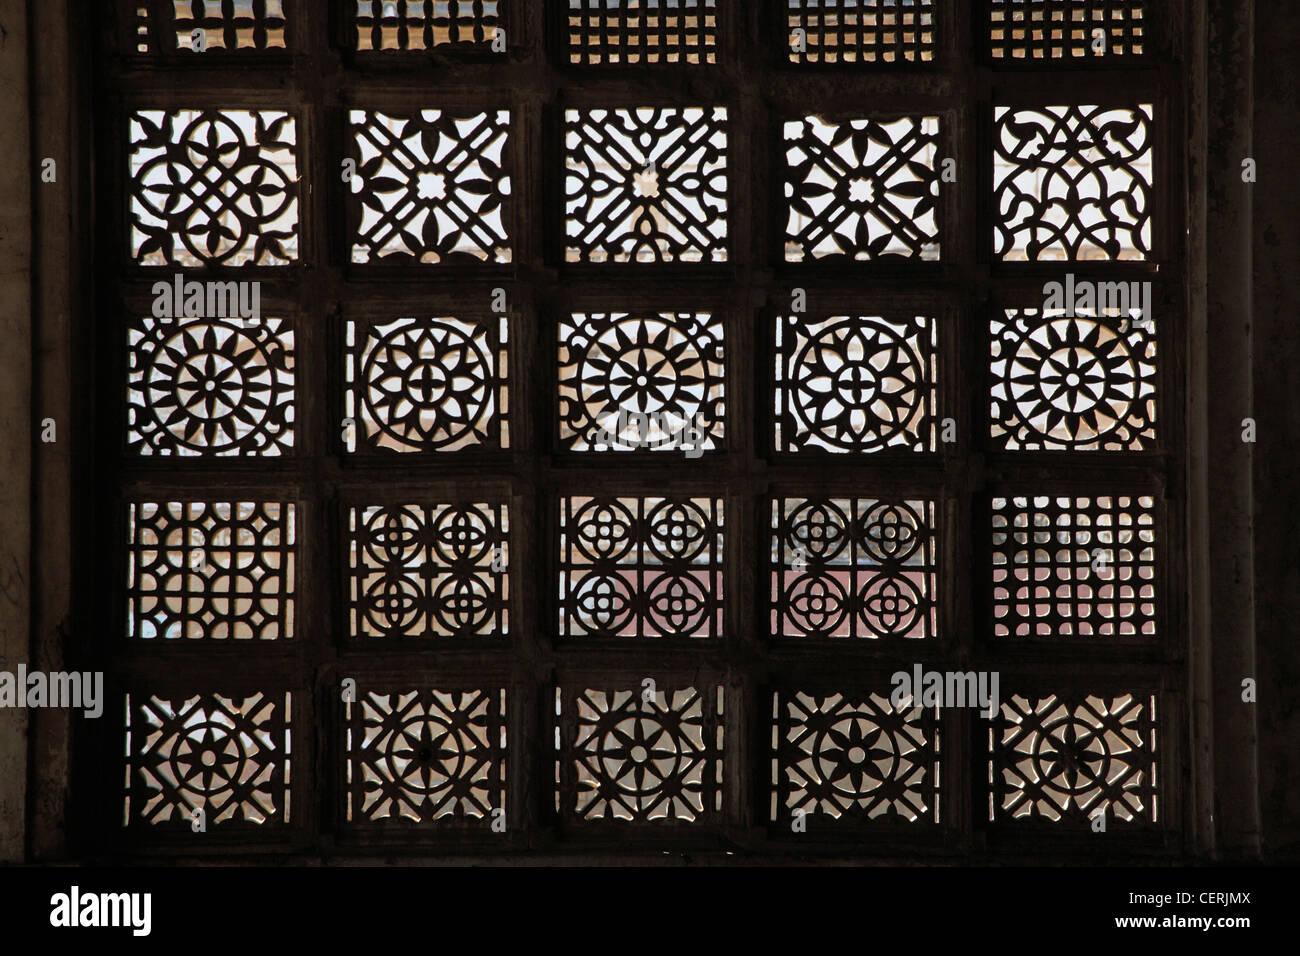 India, Gujarat, Ahmedabad, Sarkhej Rosa, jaali, carved stone window, - Stock Image